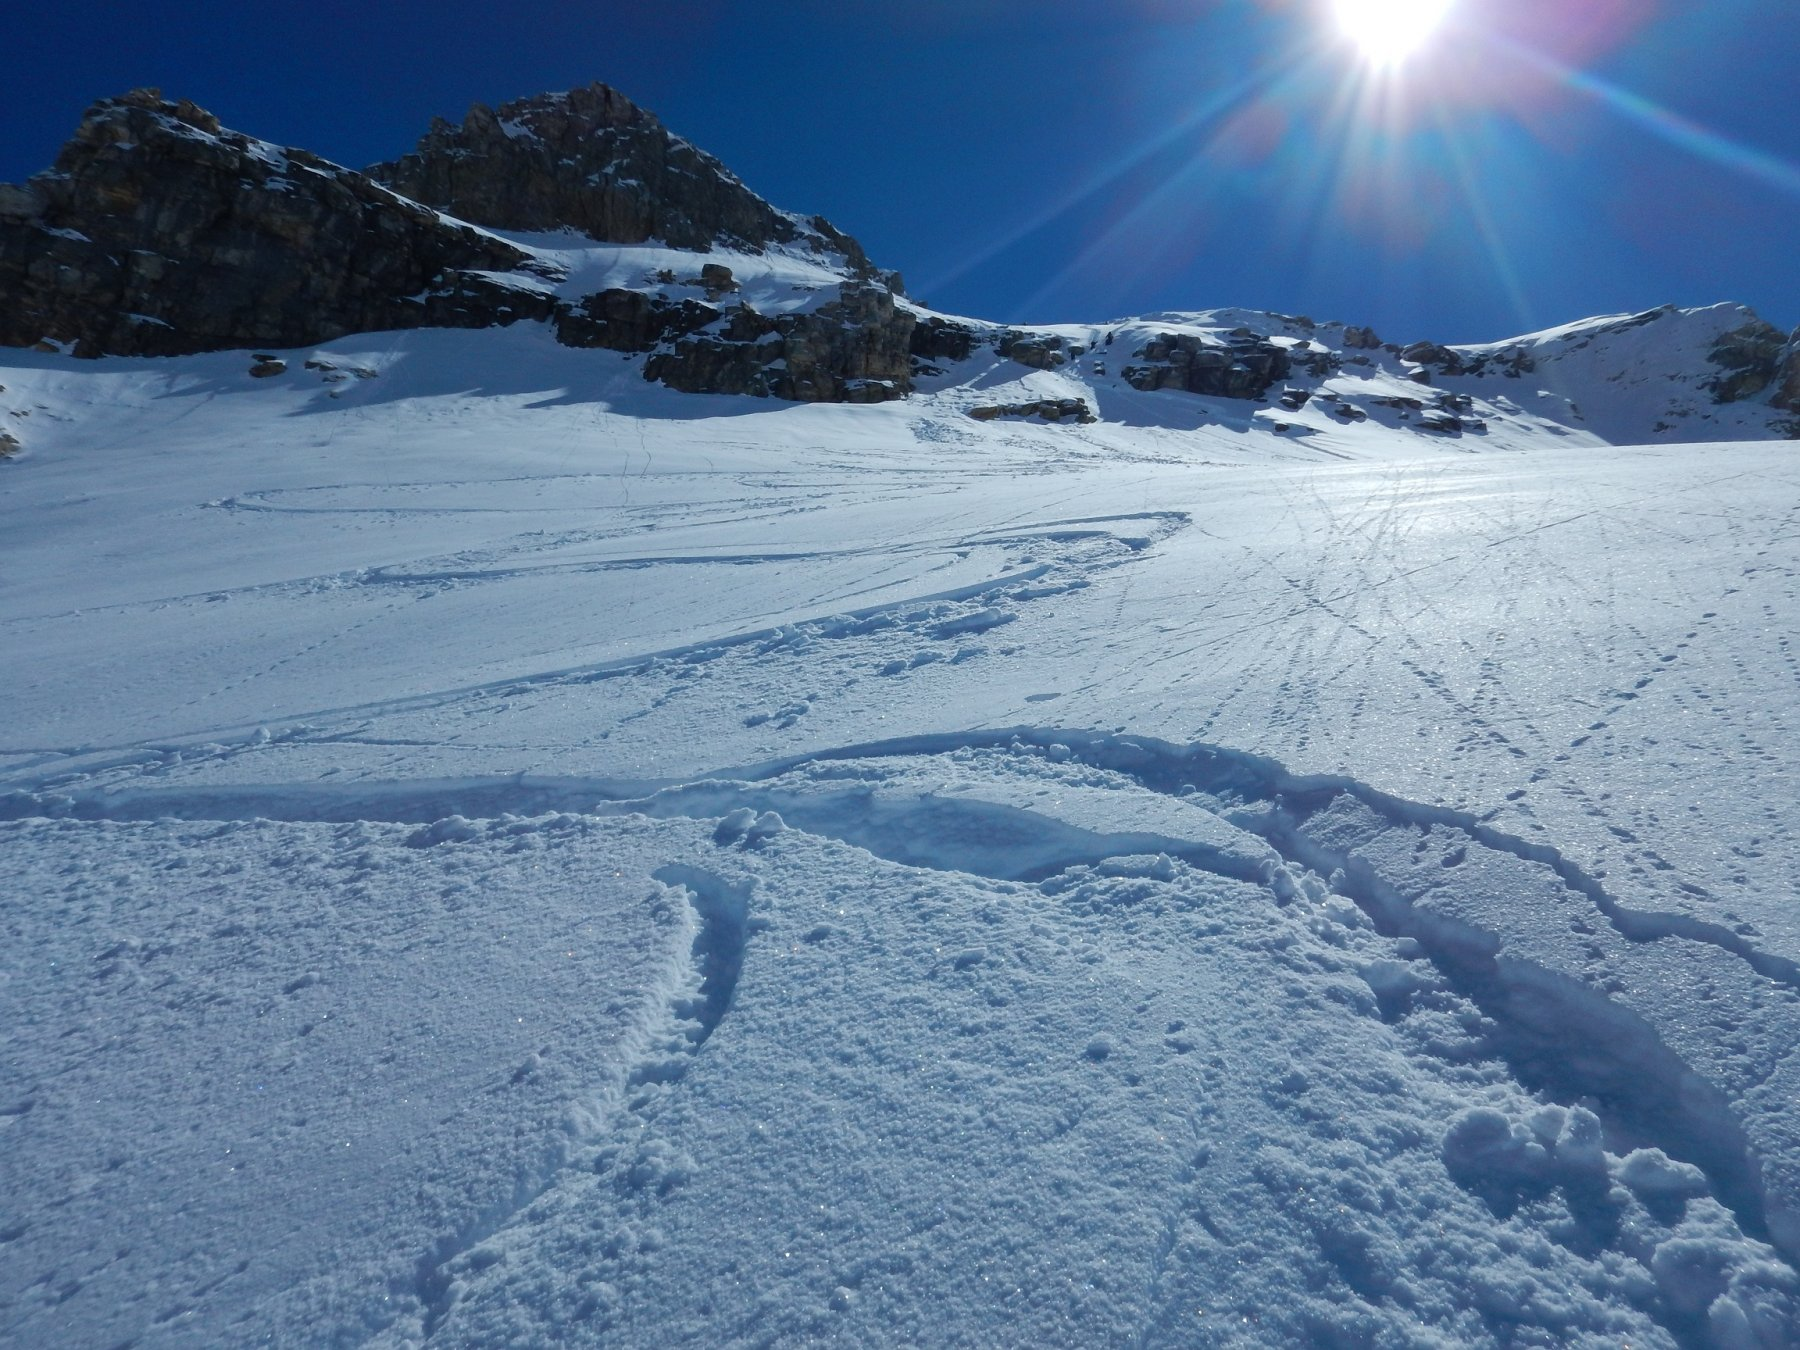 gran bella neve